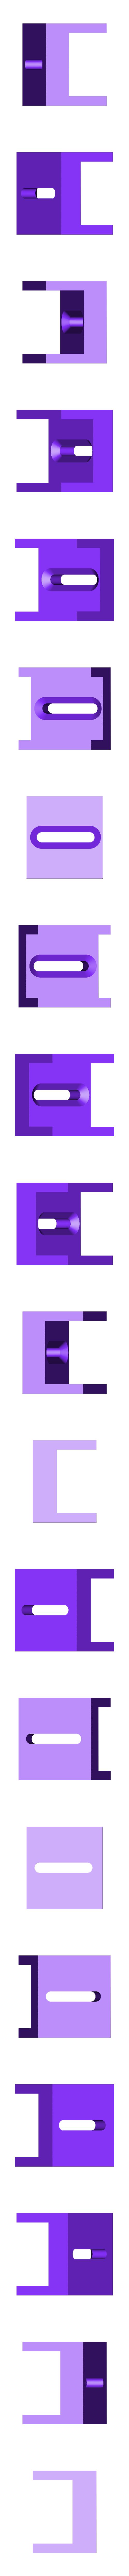 Servo_Bracket.stl Download free STL file Experimental Multirotor • 3D printable model, SeanTheITGuy